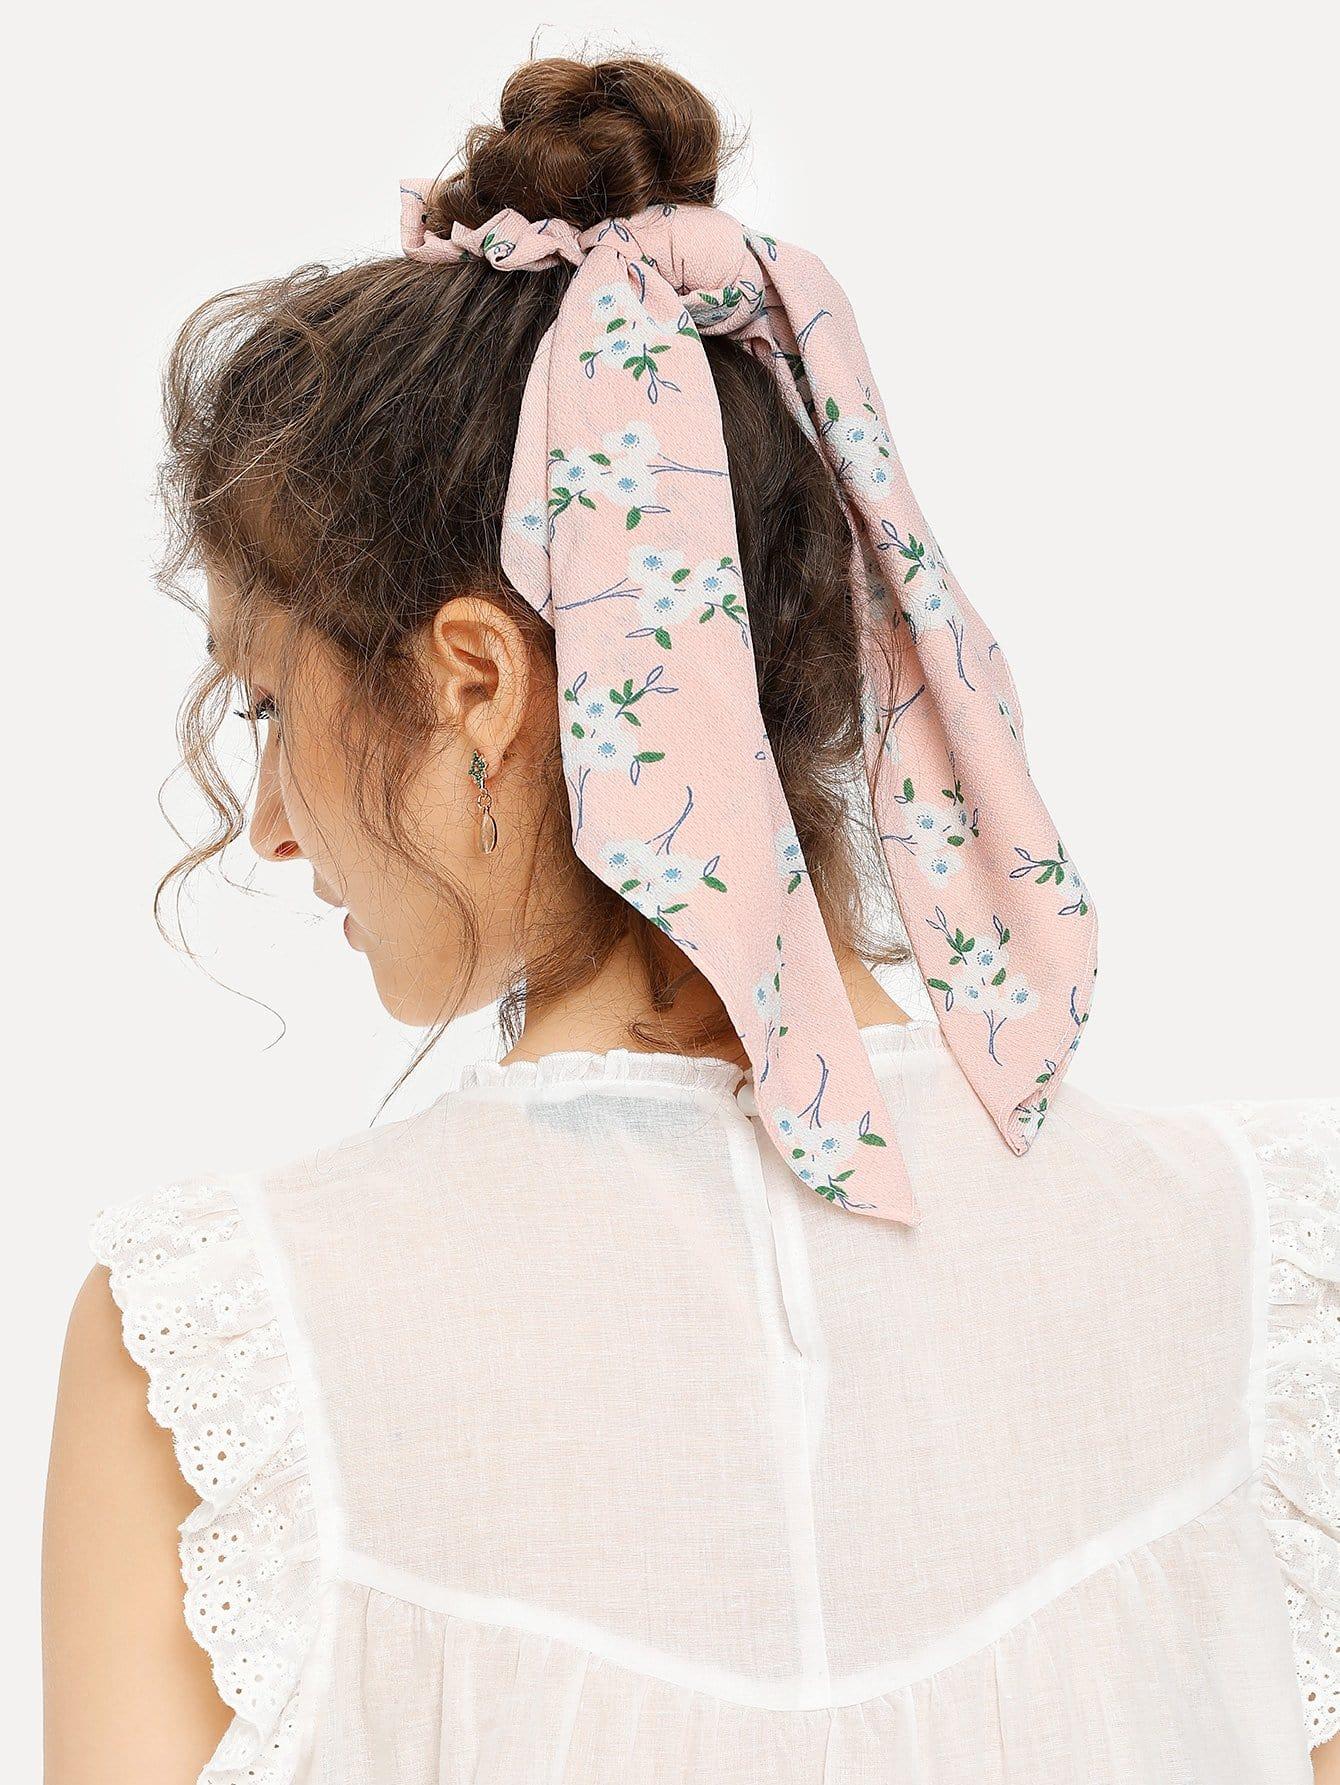 Calico Bow Tie Hair Tie hair tie 3pcs